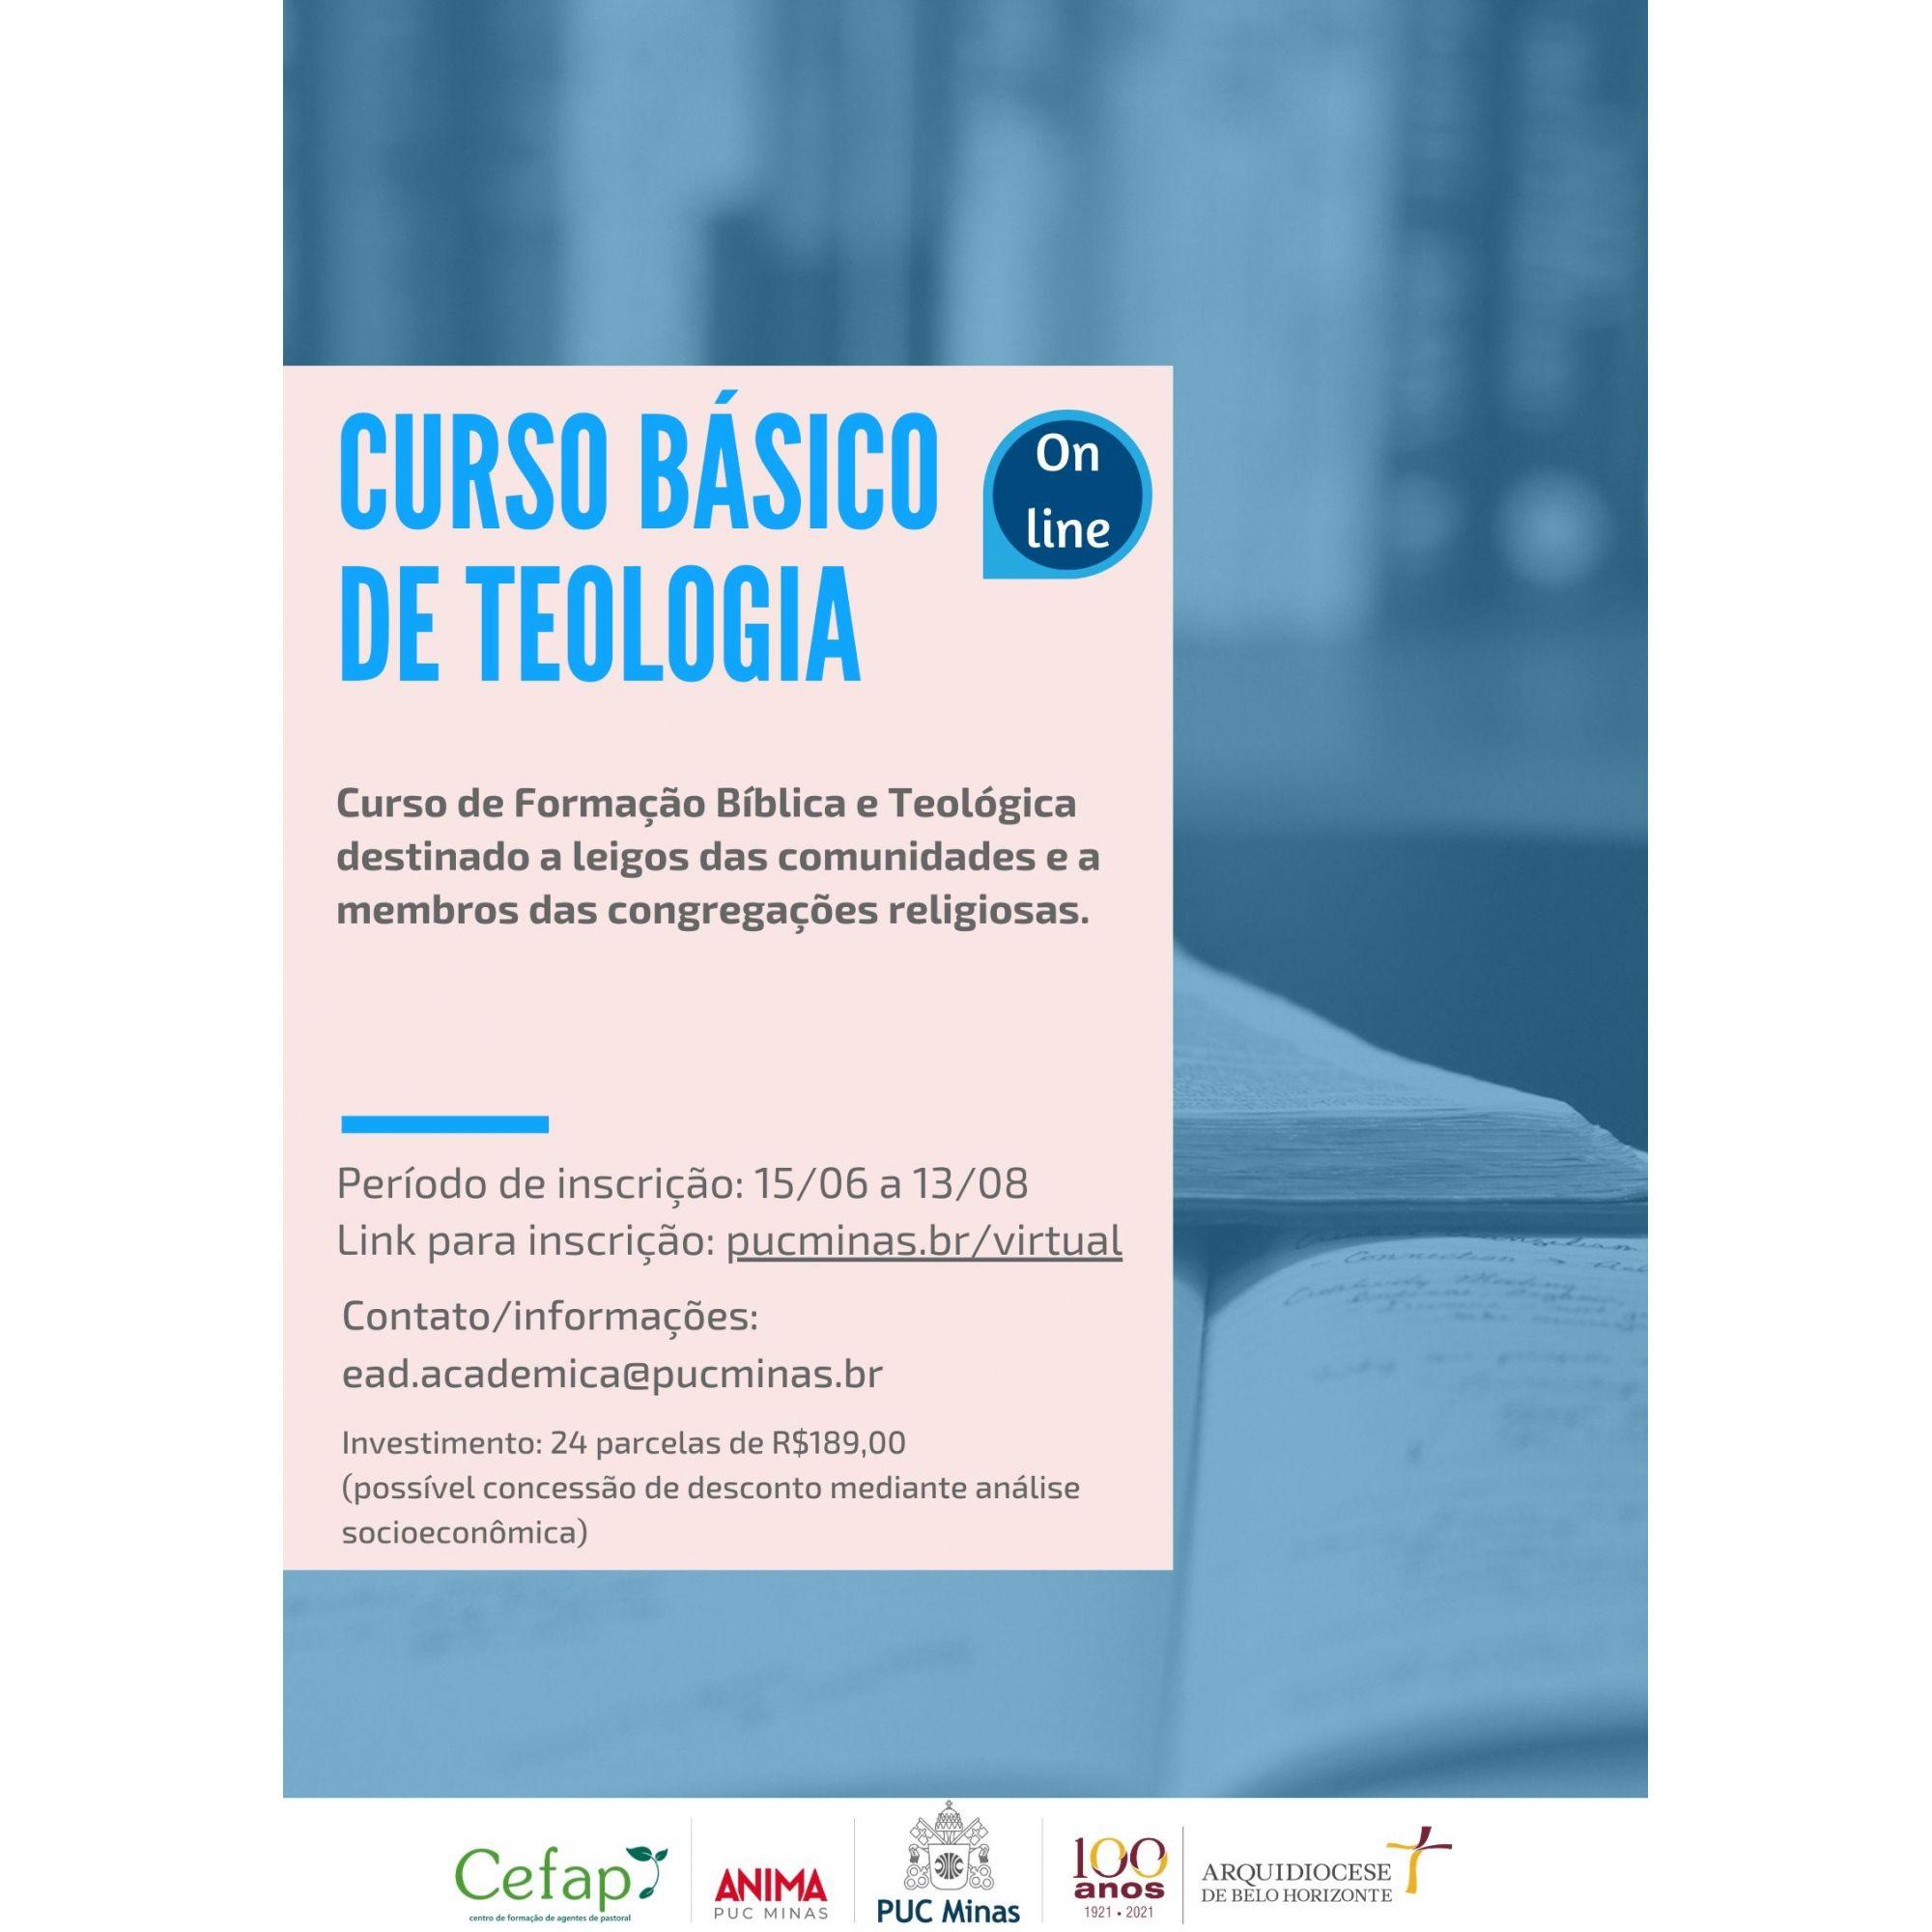 Curso Básico de Teologia  - PUC Minas